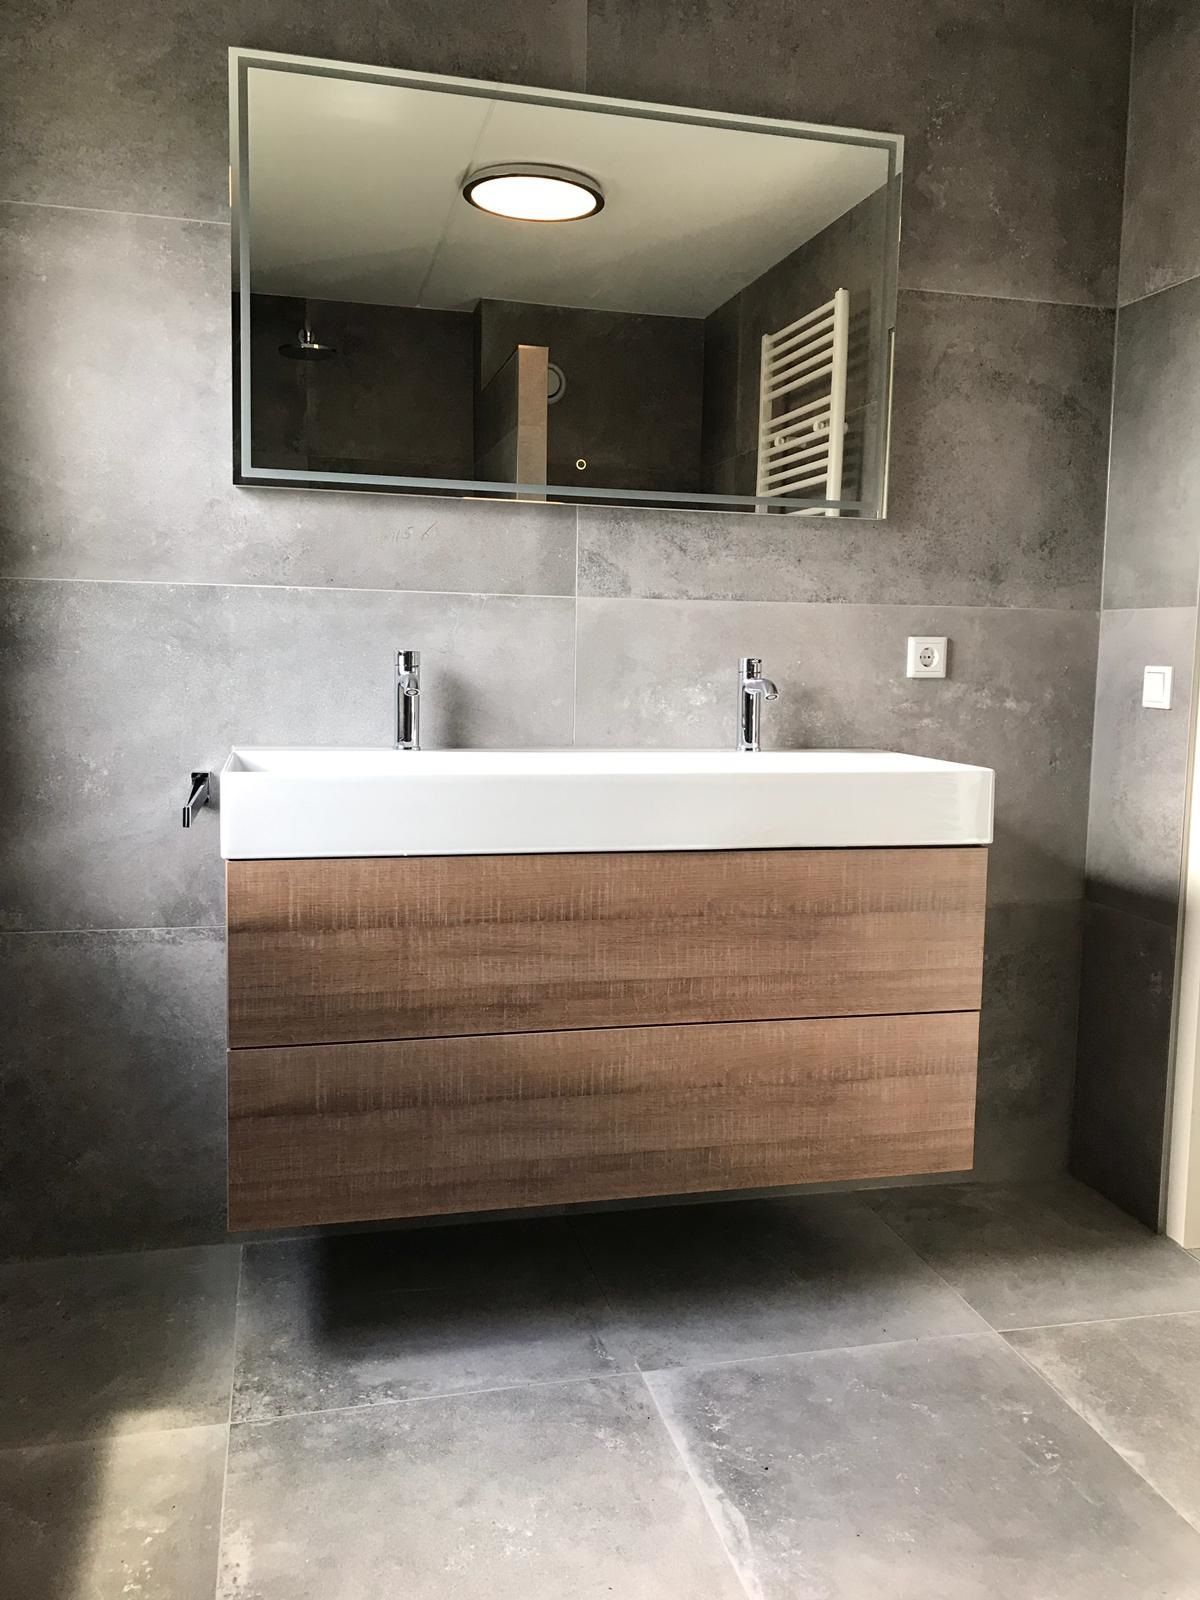 Prachtige Betonlook Badkamer Gerealiseerd Bathroom Tiles Badkamerinspiratie Prachtige Beton In 2020 Kleines Bad Renovierungen Badezimmer Badezimmer Innenausstattung